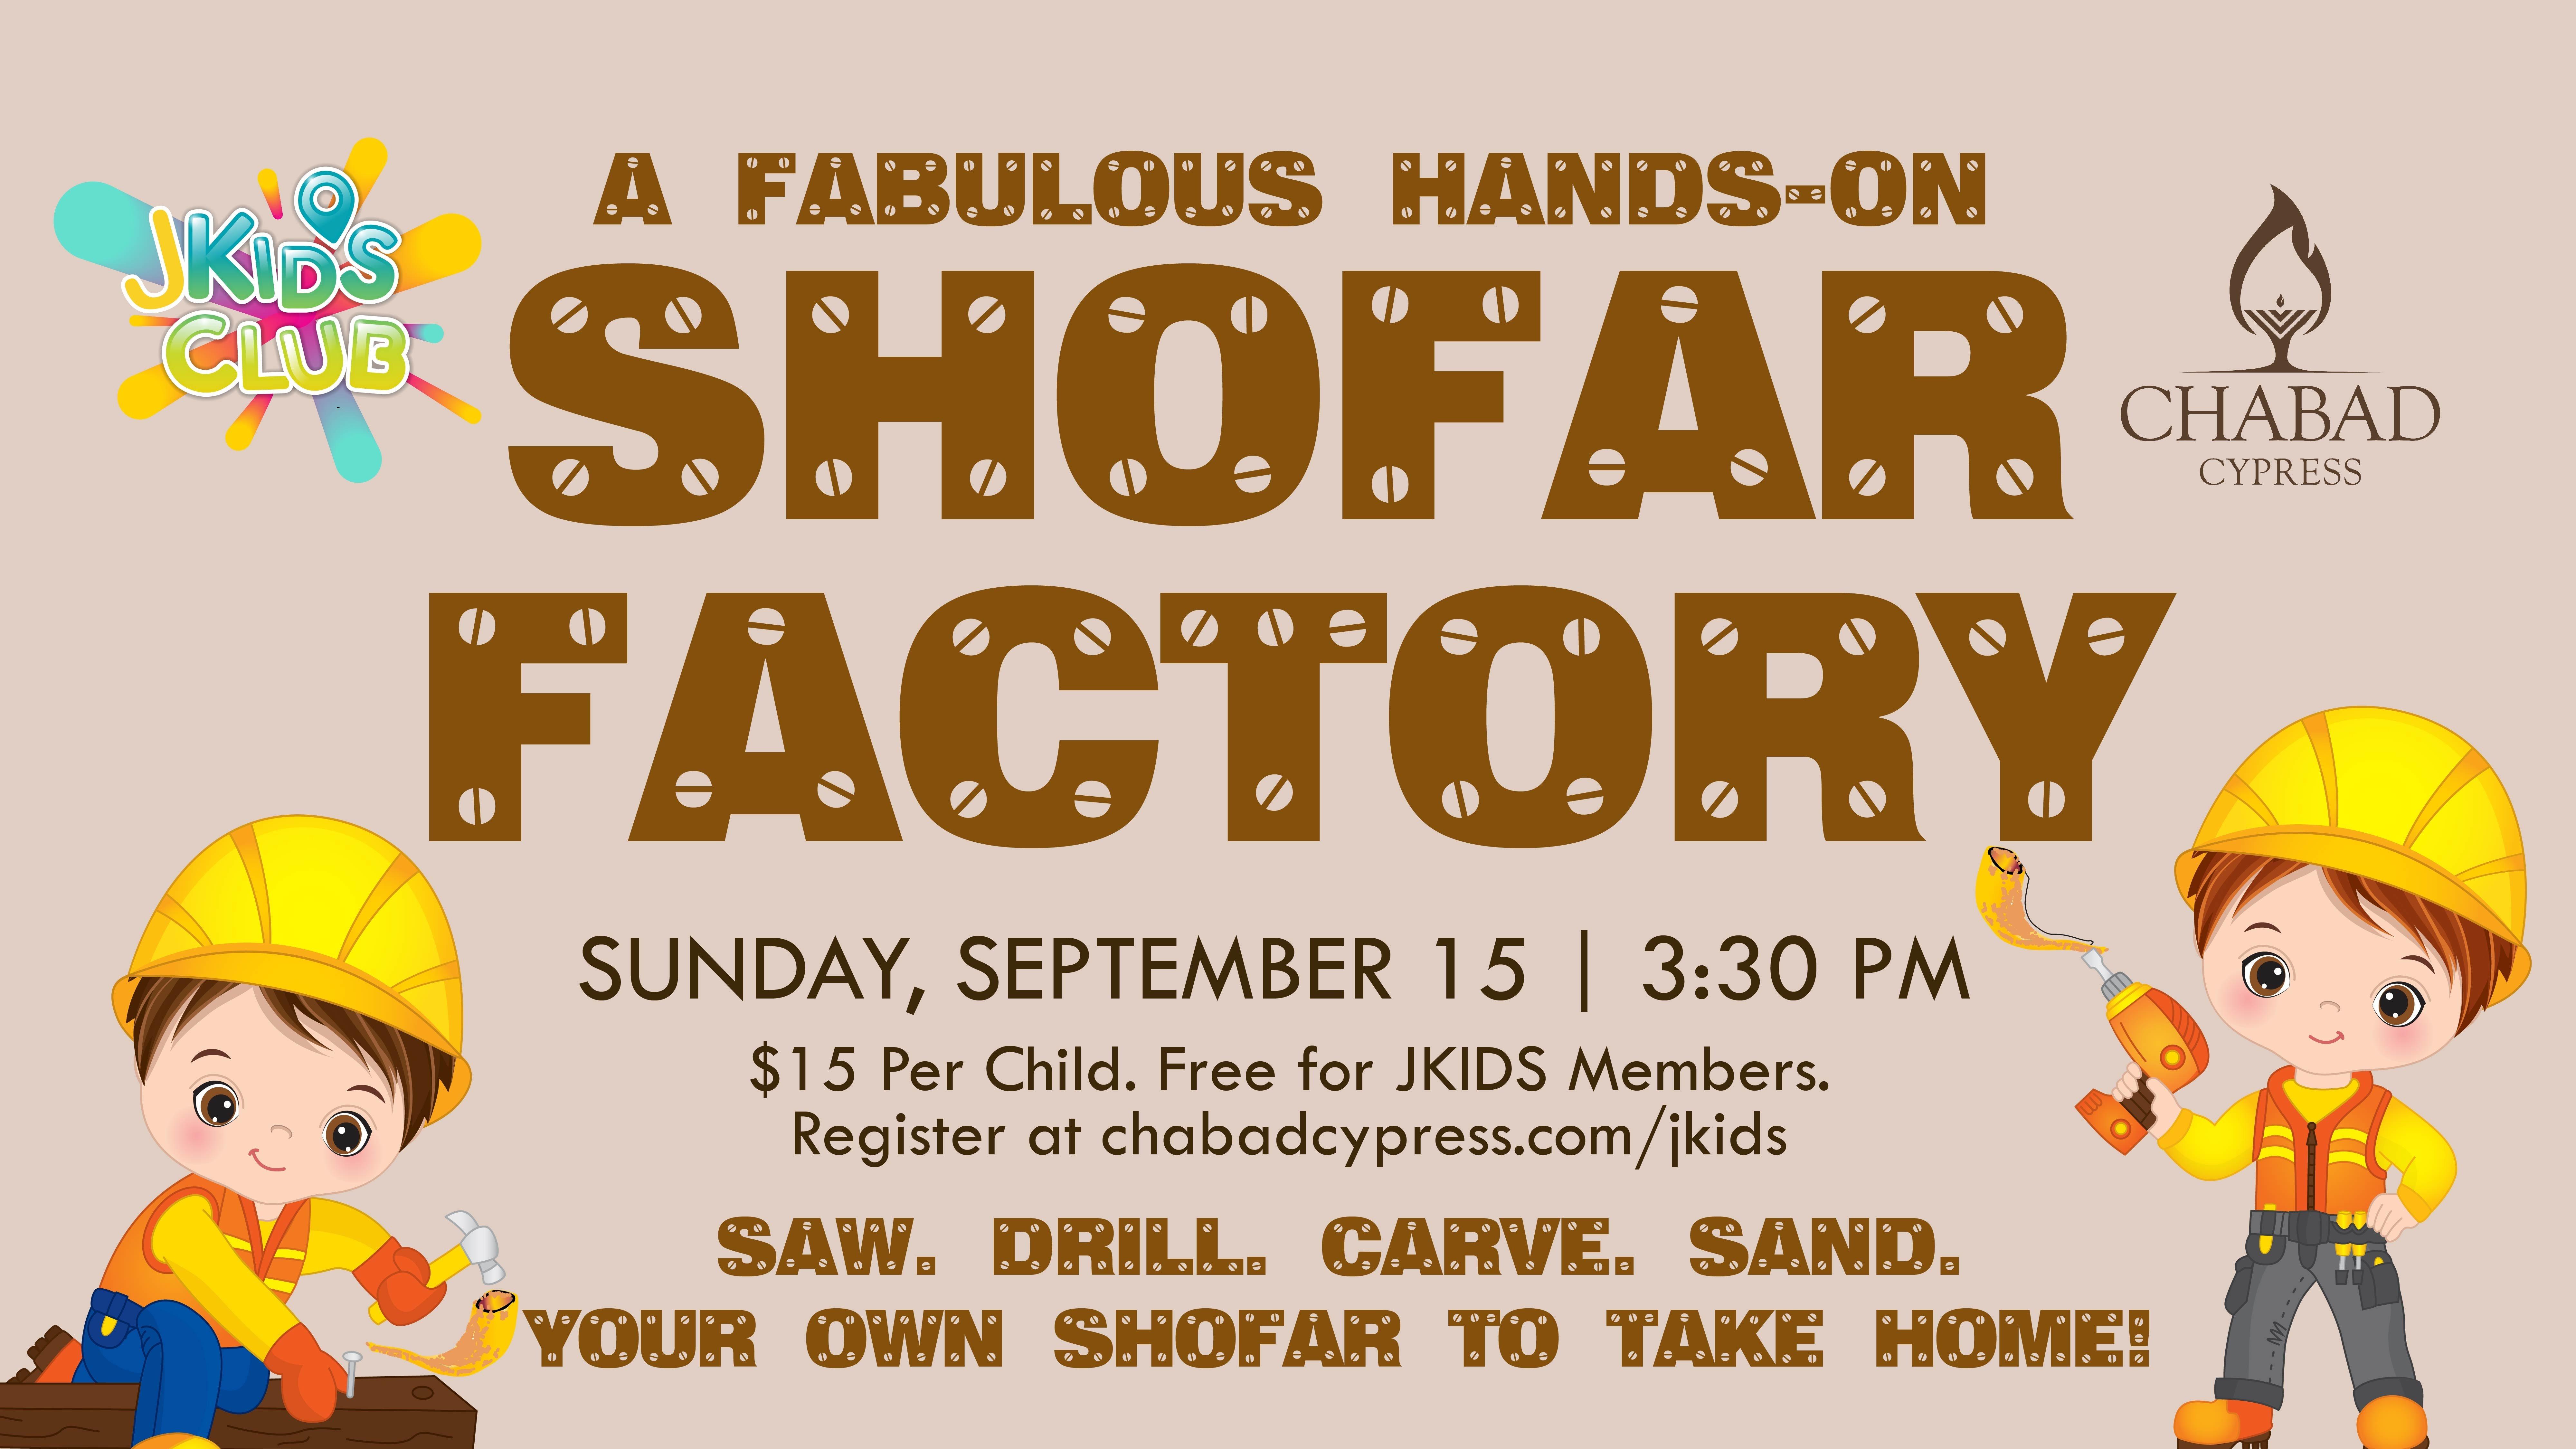 shofar factory-01.jpg